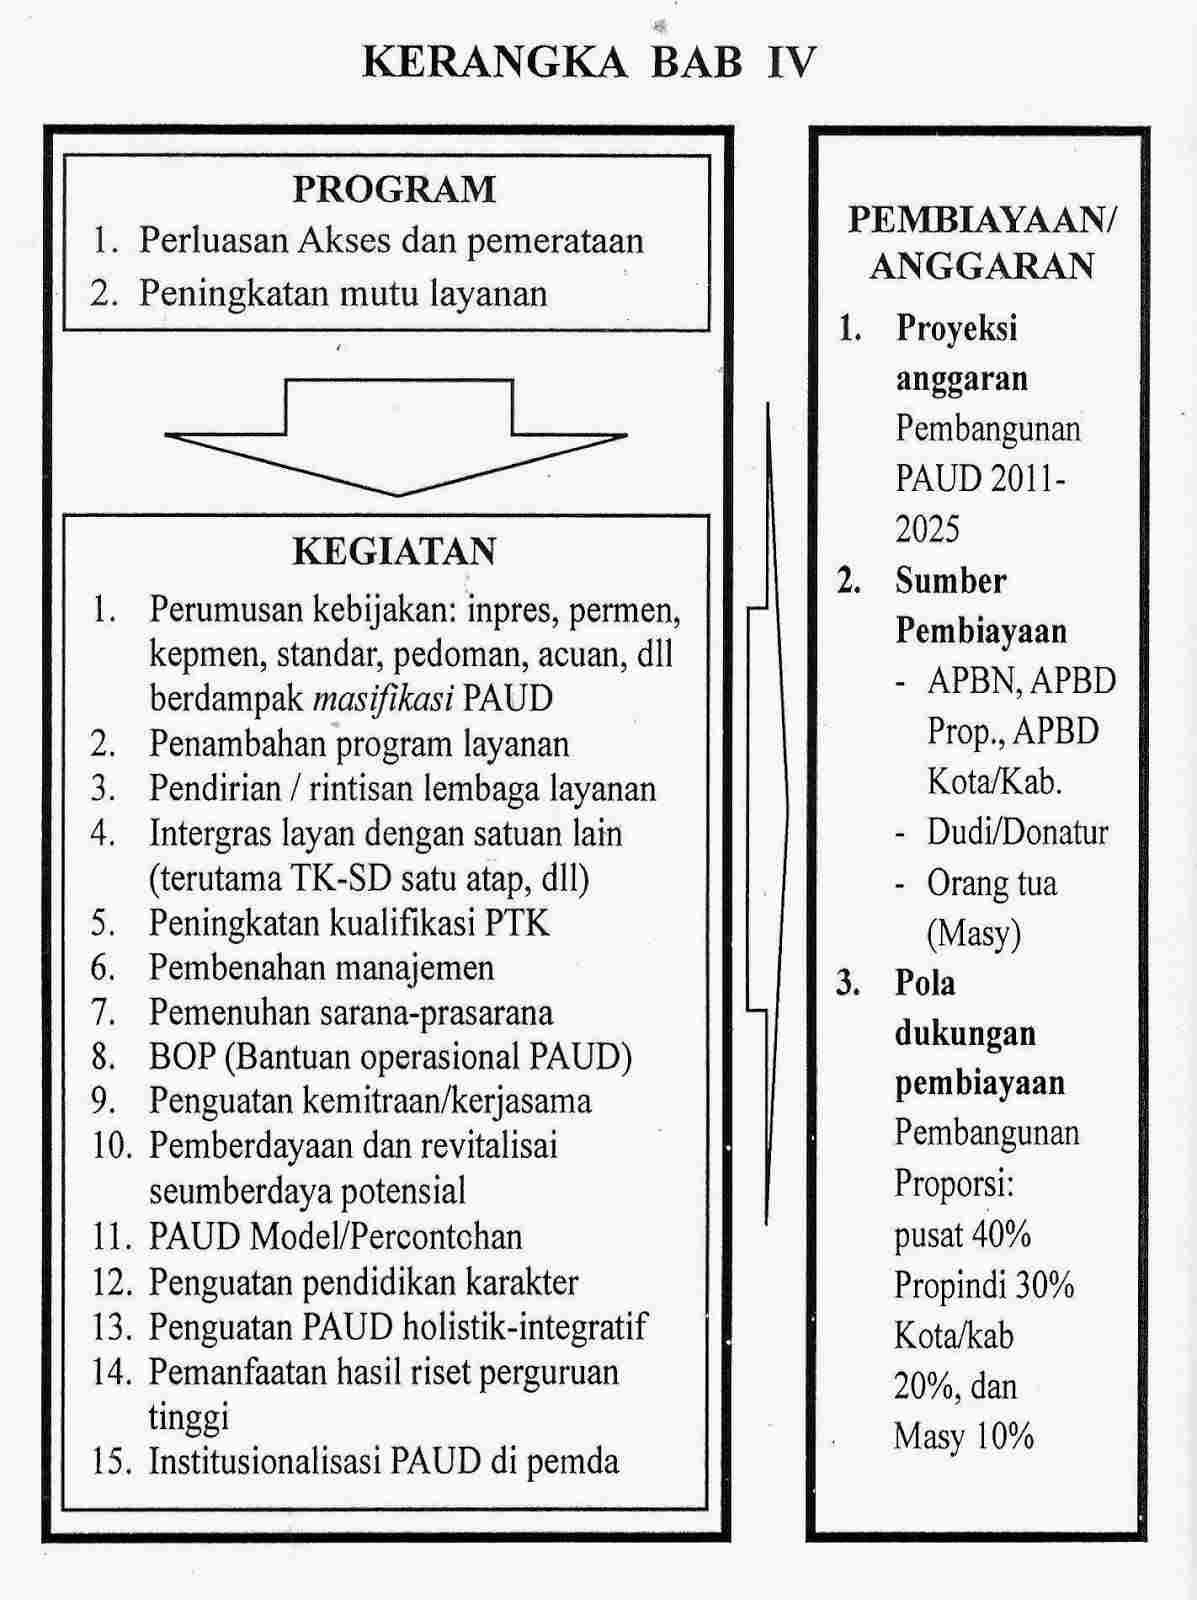 strategi pembangunan paud di indonesia